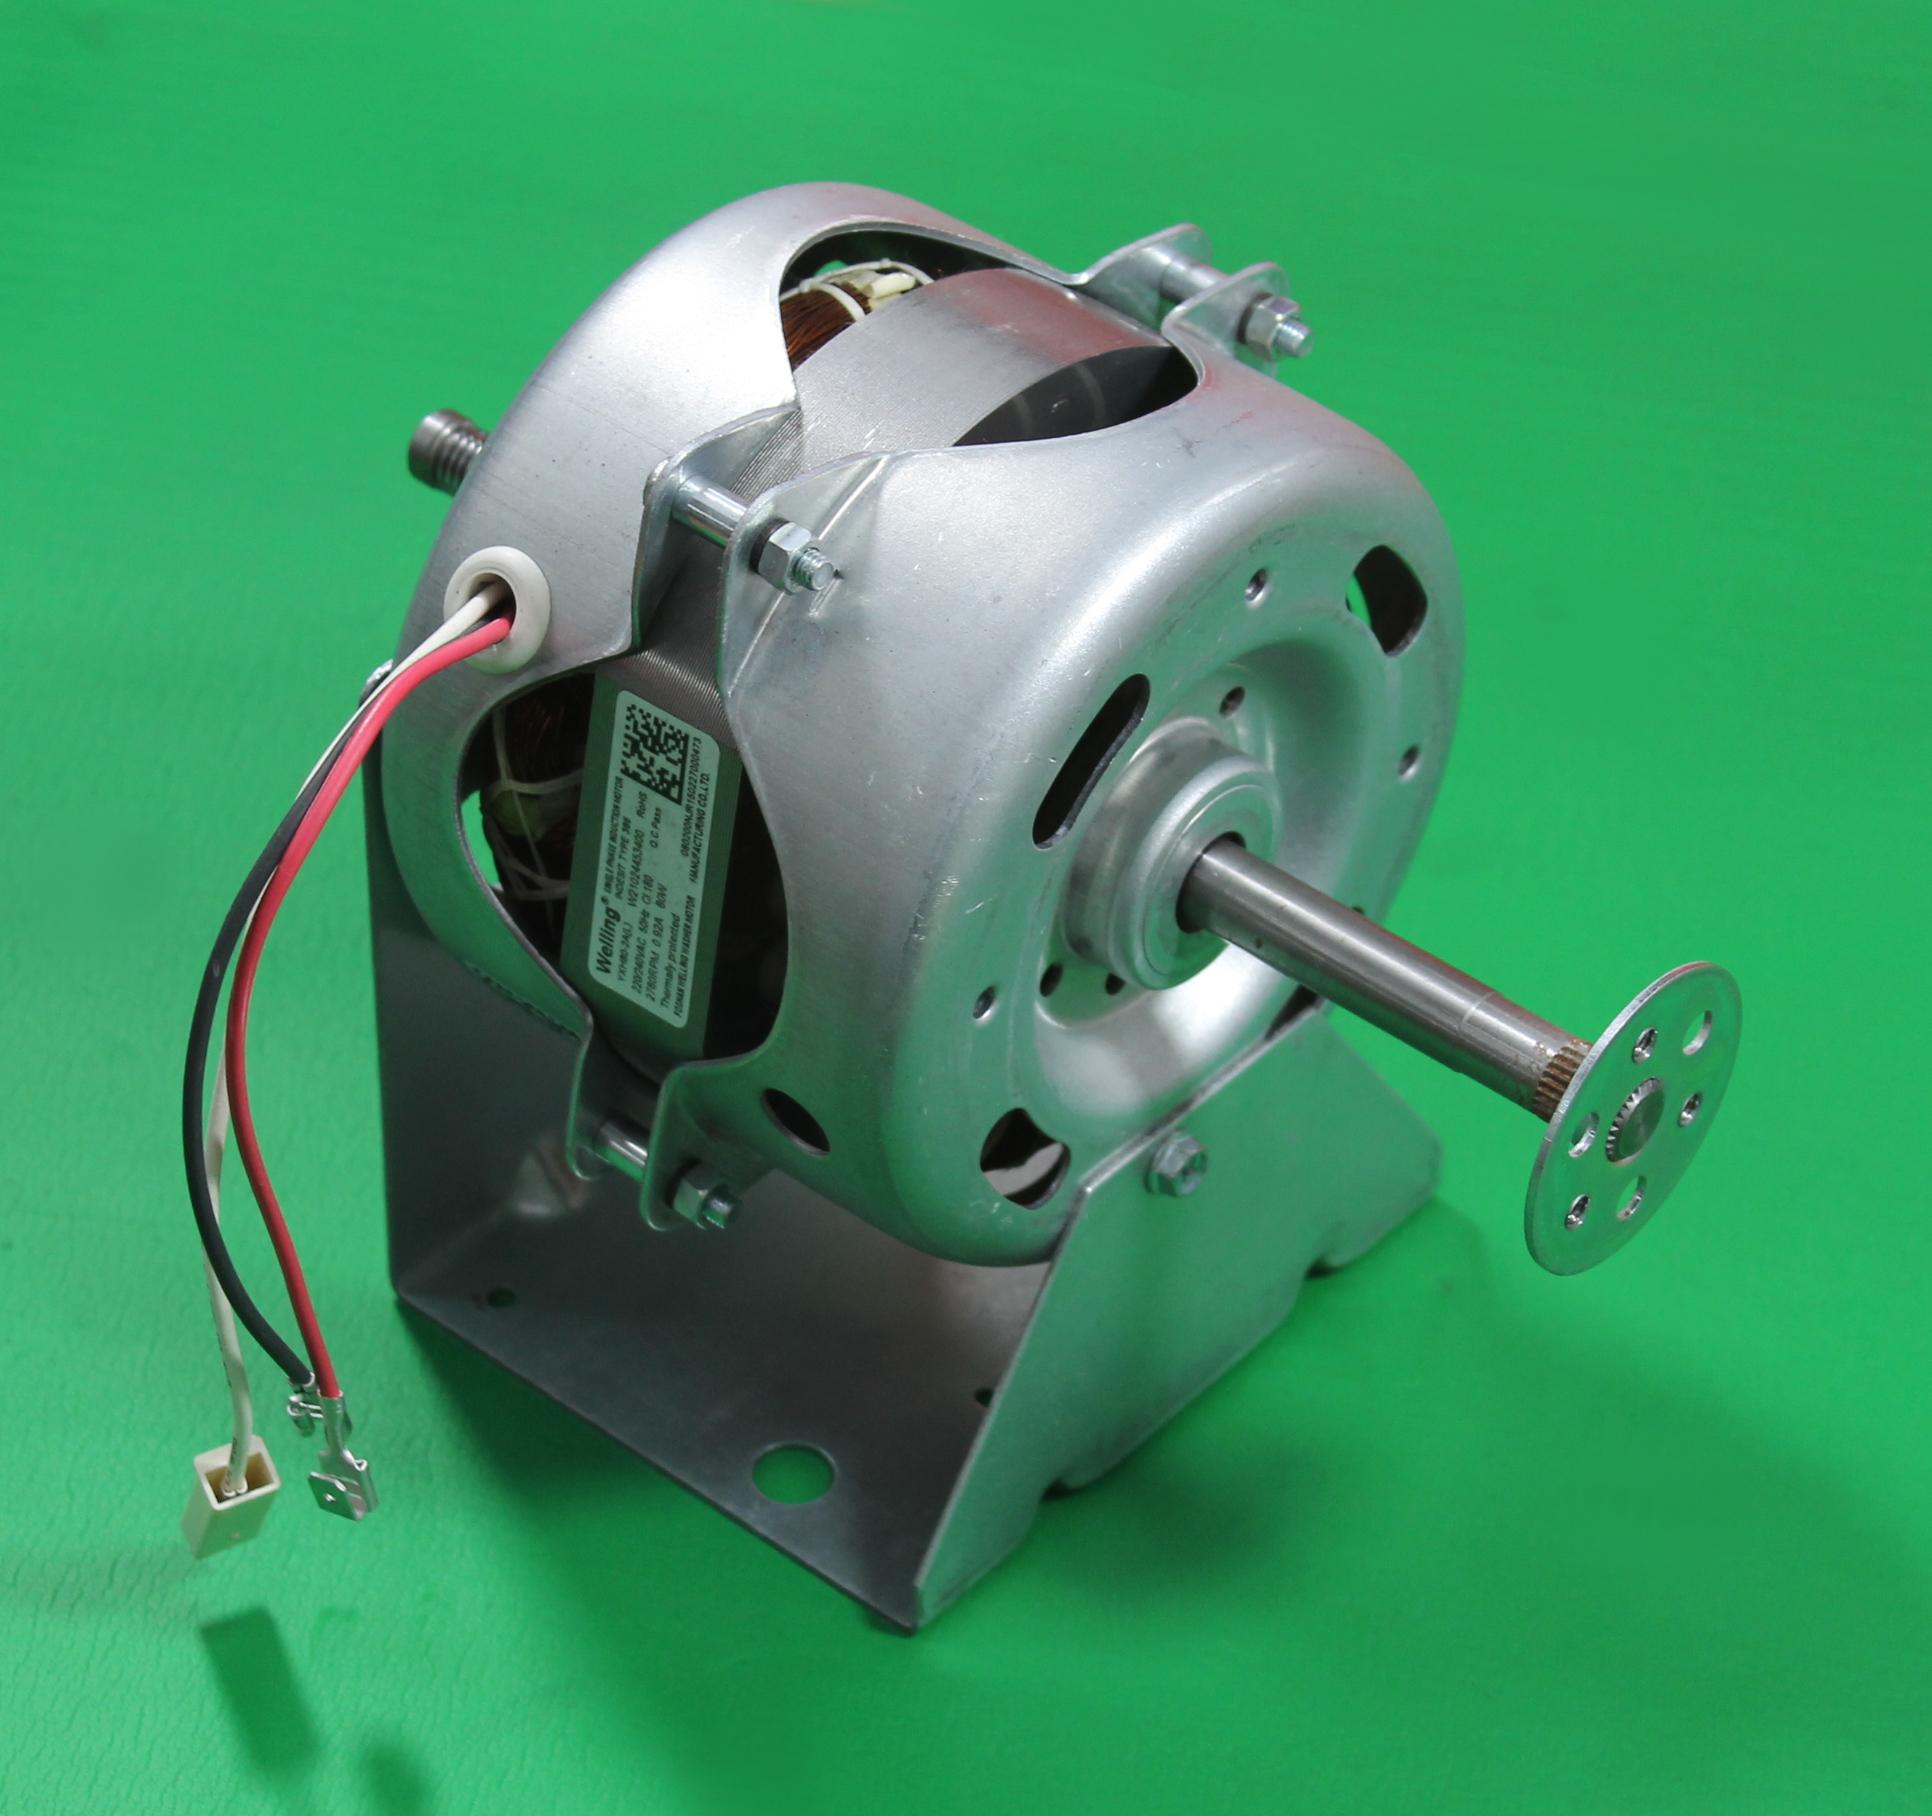 Hotpoint Tvhm80 Tumble Dryer Motor Welling Yxh80 2a L Ebay